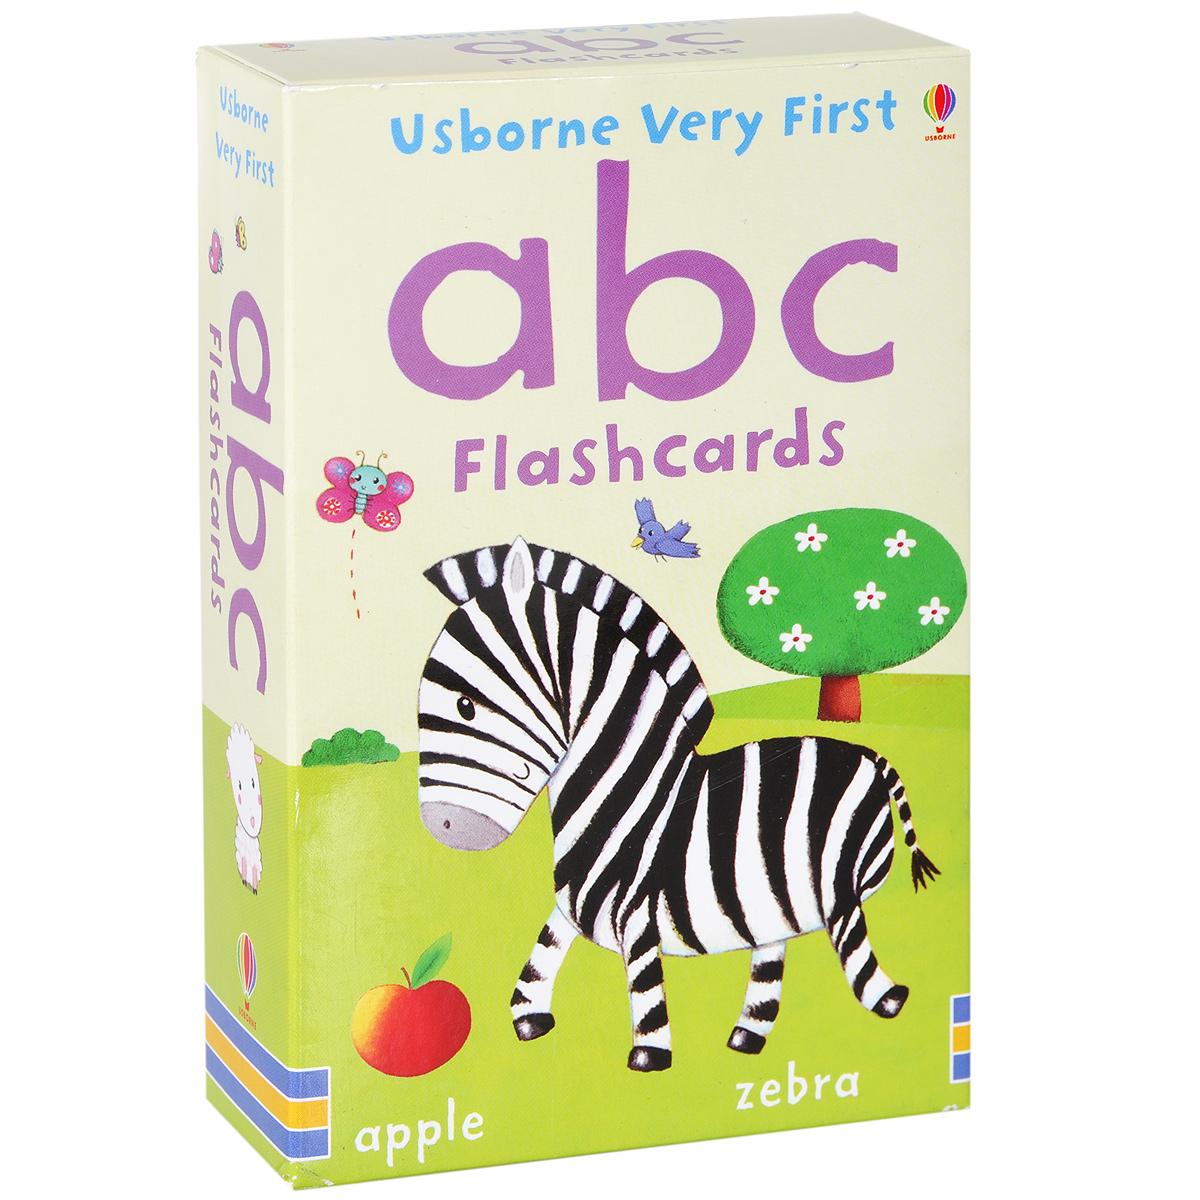 Usborne Very First ABC Flashcards (набор из 30 карточек) 123 flashcards